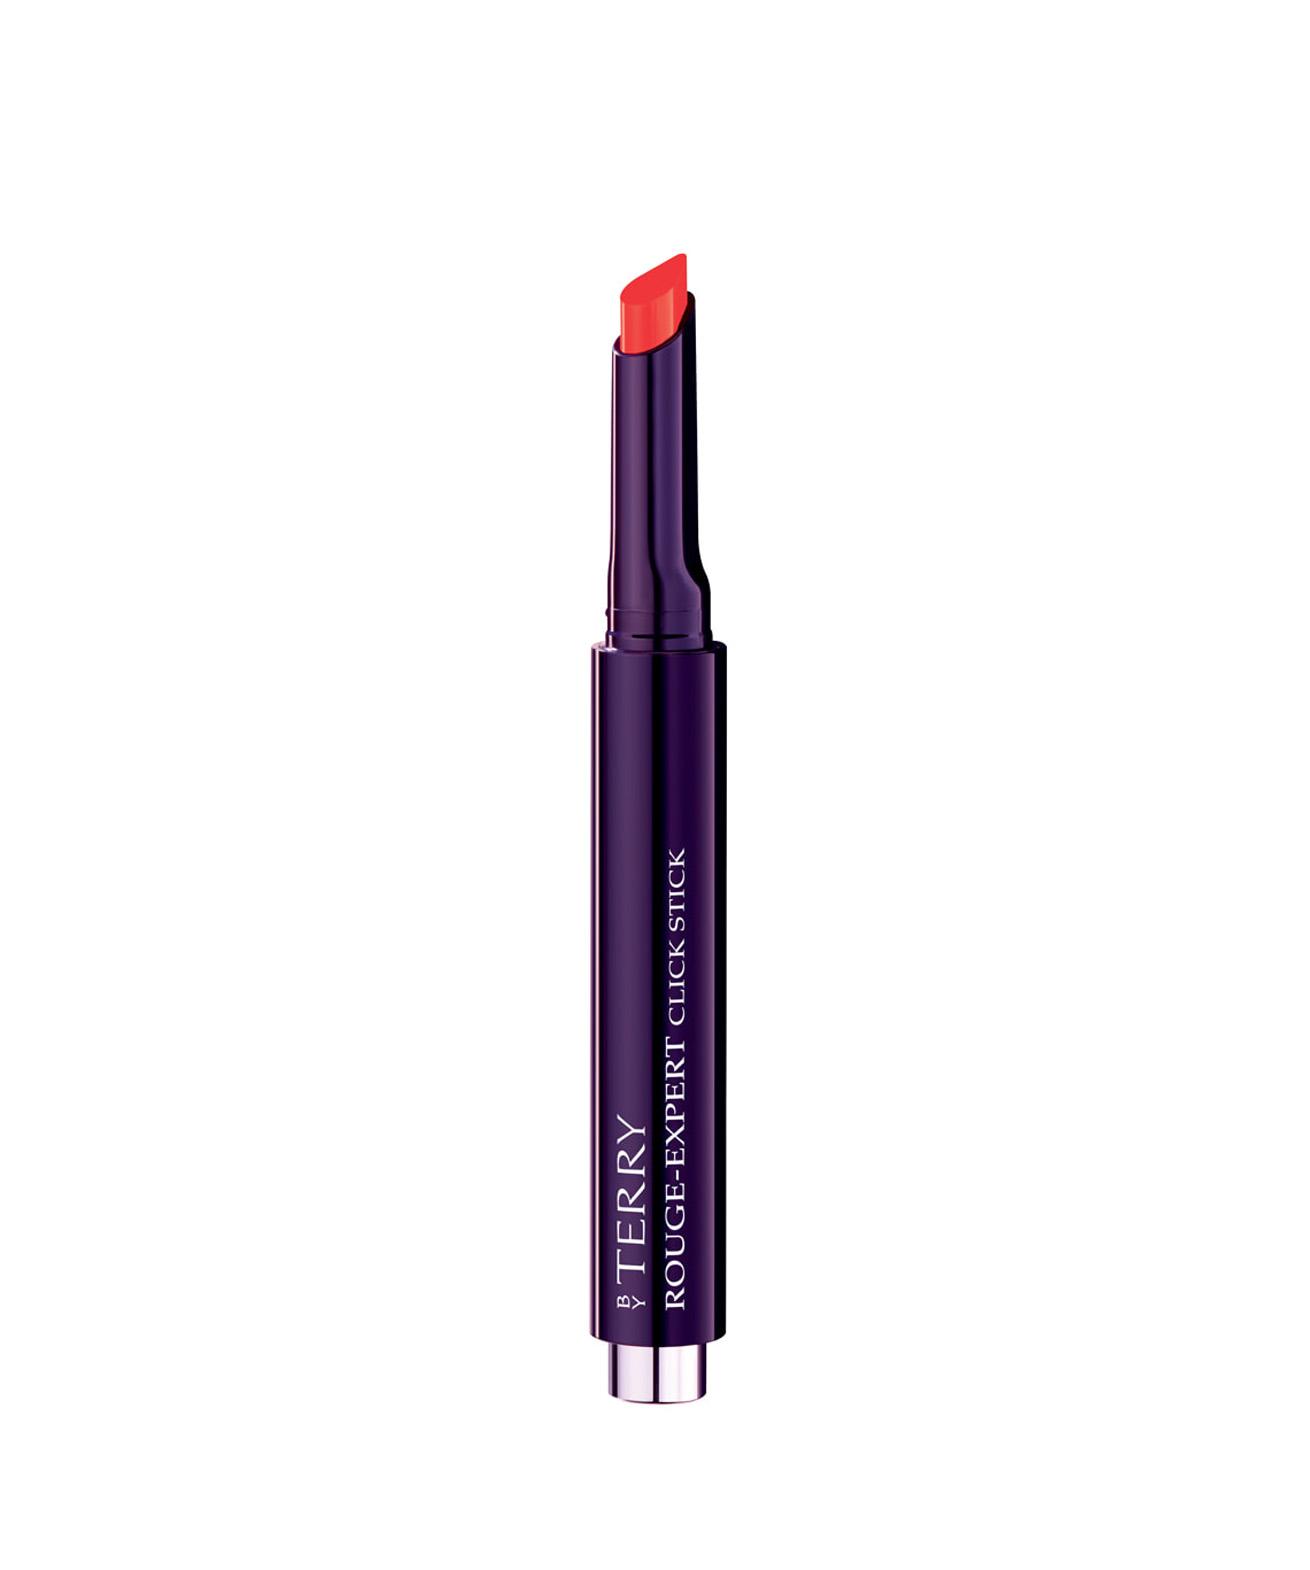 2-Rouge-Expert-Click-Stick-rossetto-ibrido-intenso-lunga-durata-Linea-makeup-di-nicchia-By-Terry-Dispar-SpA.jpg